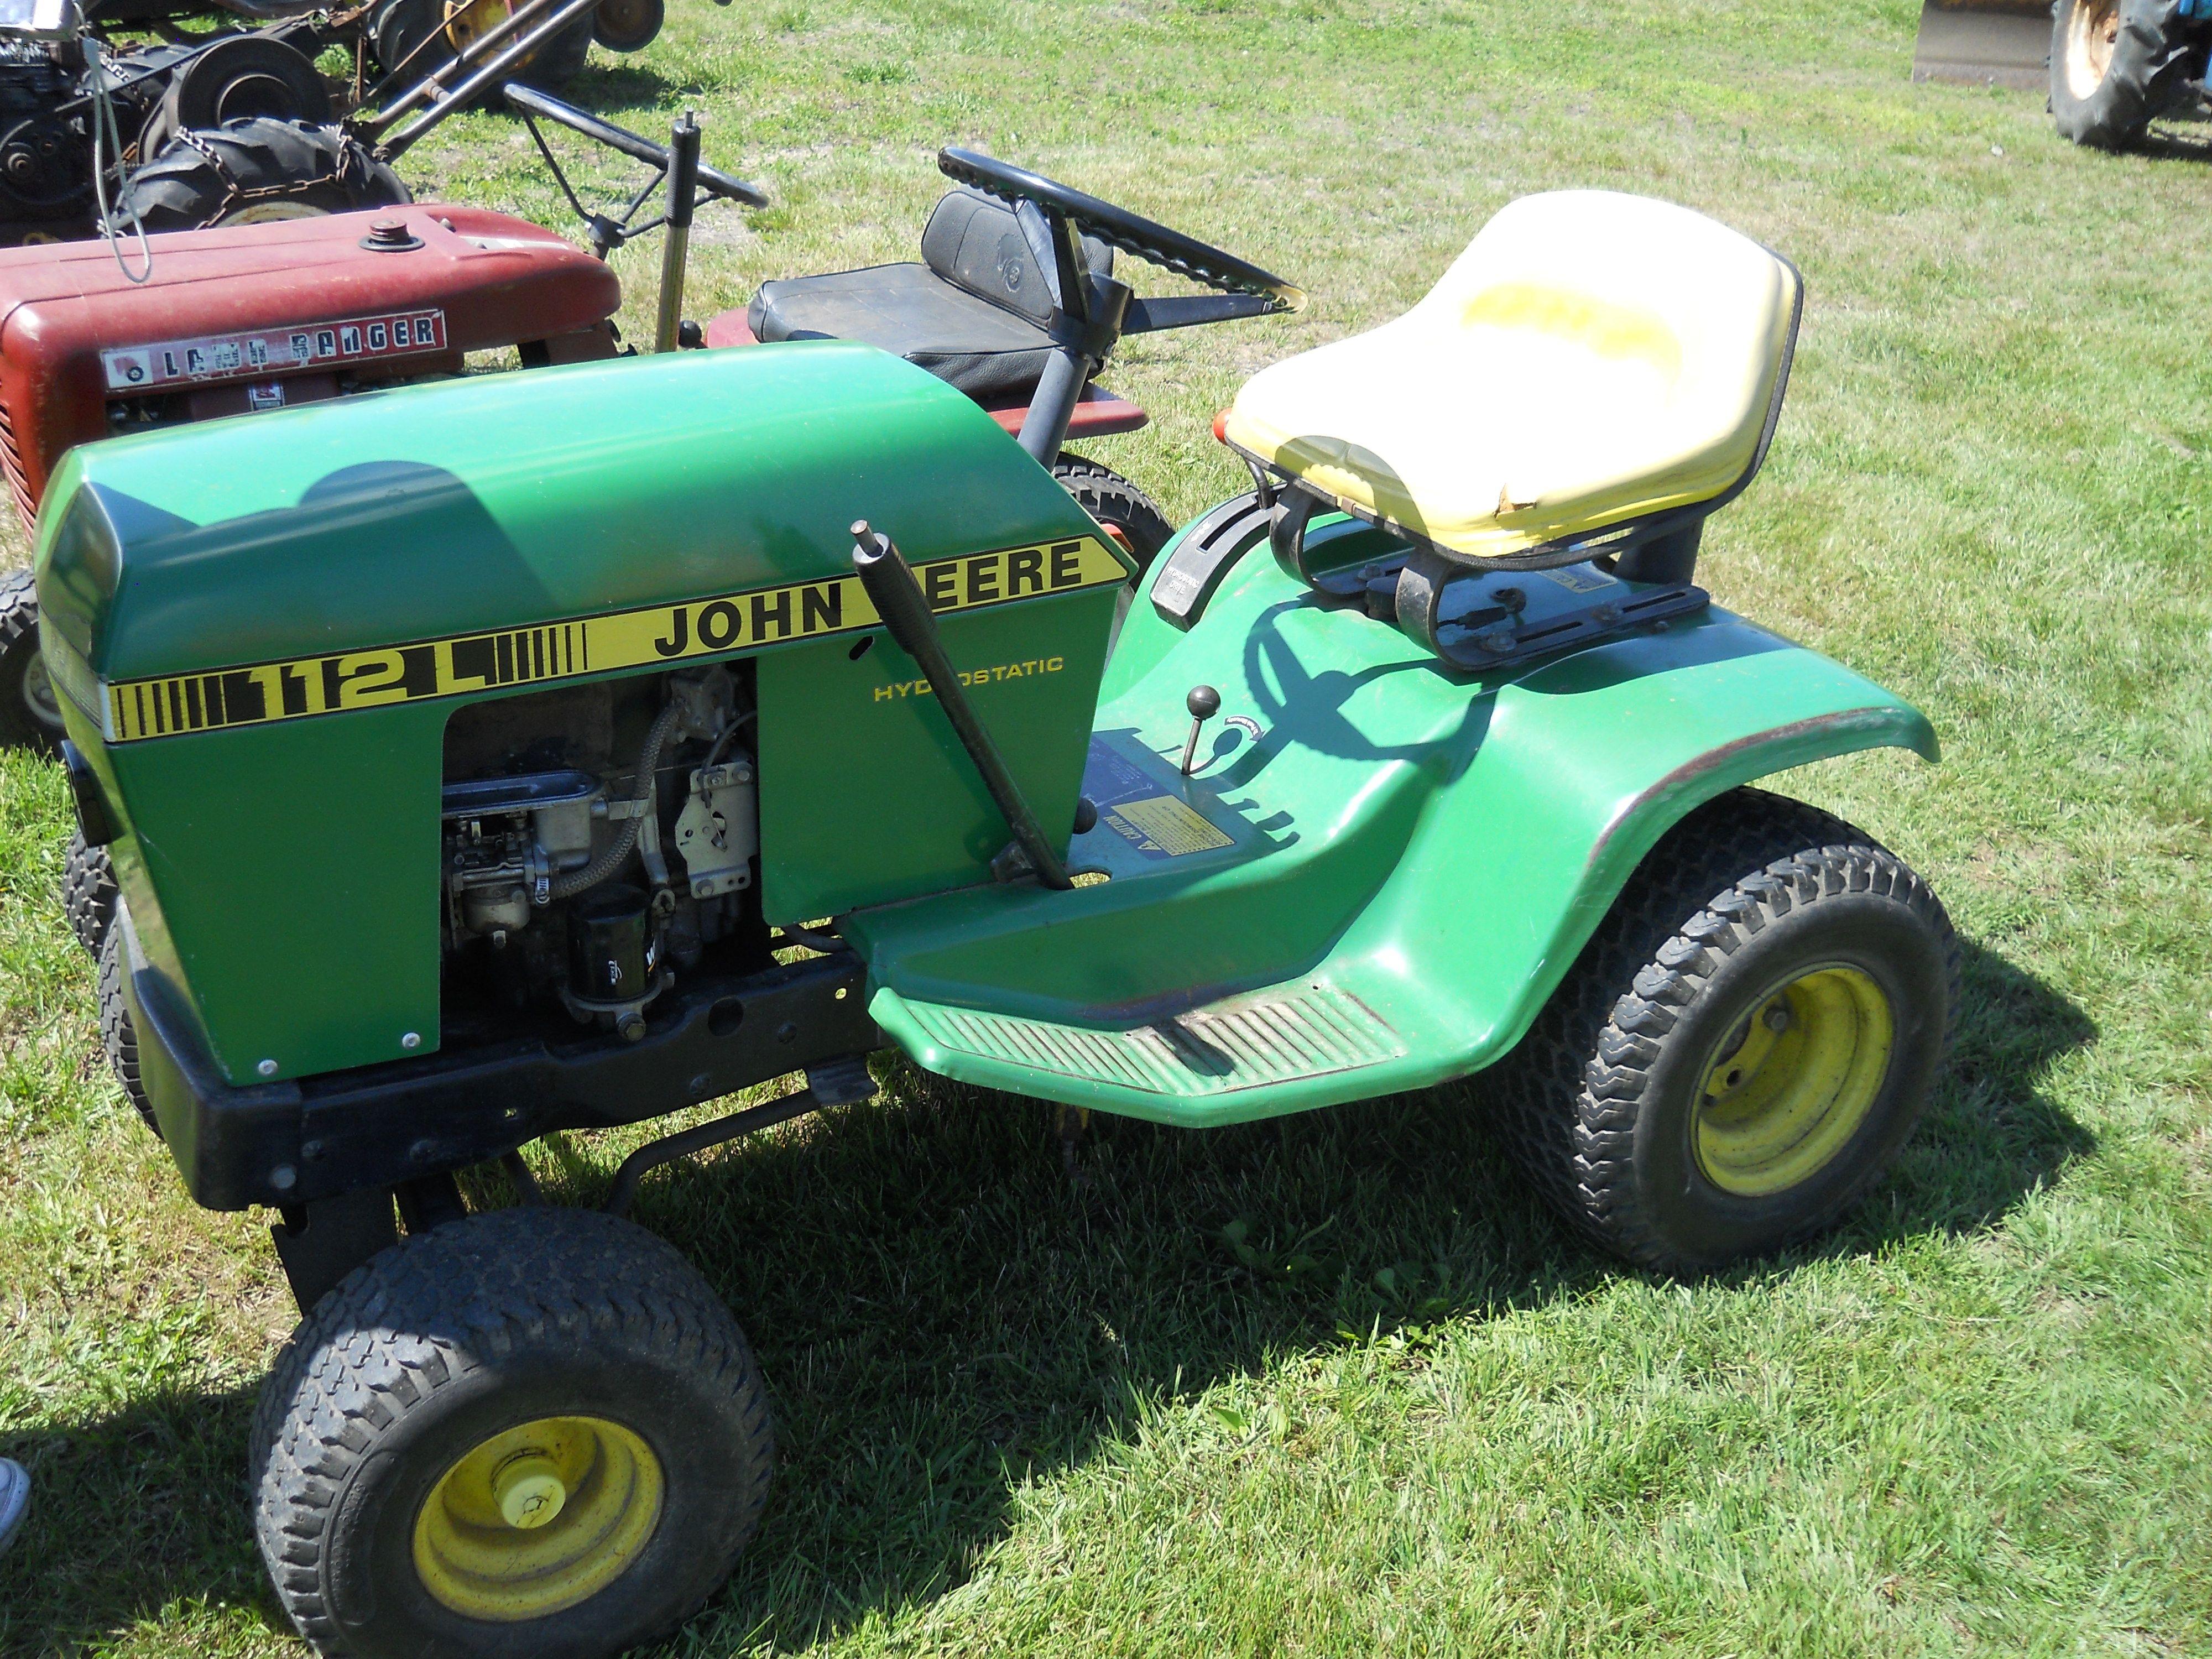 John Deere Mower Parts Lookup : L john deere lawn mower parts tractor engine and